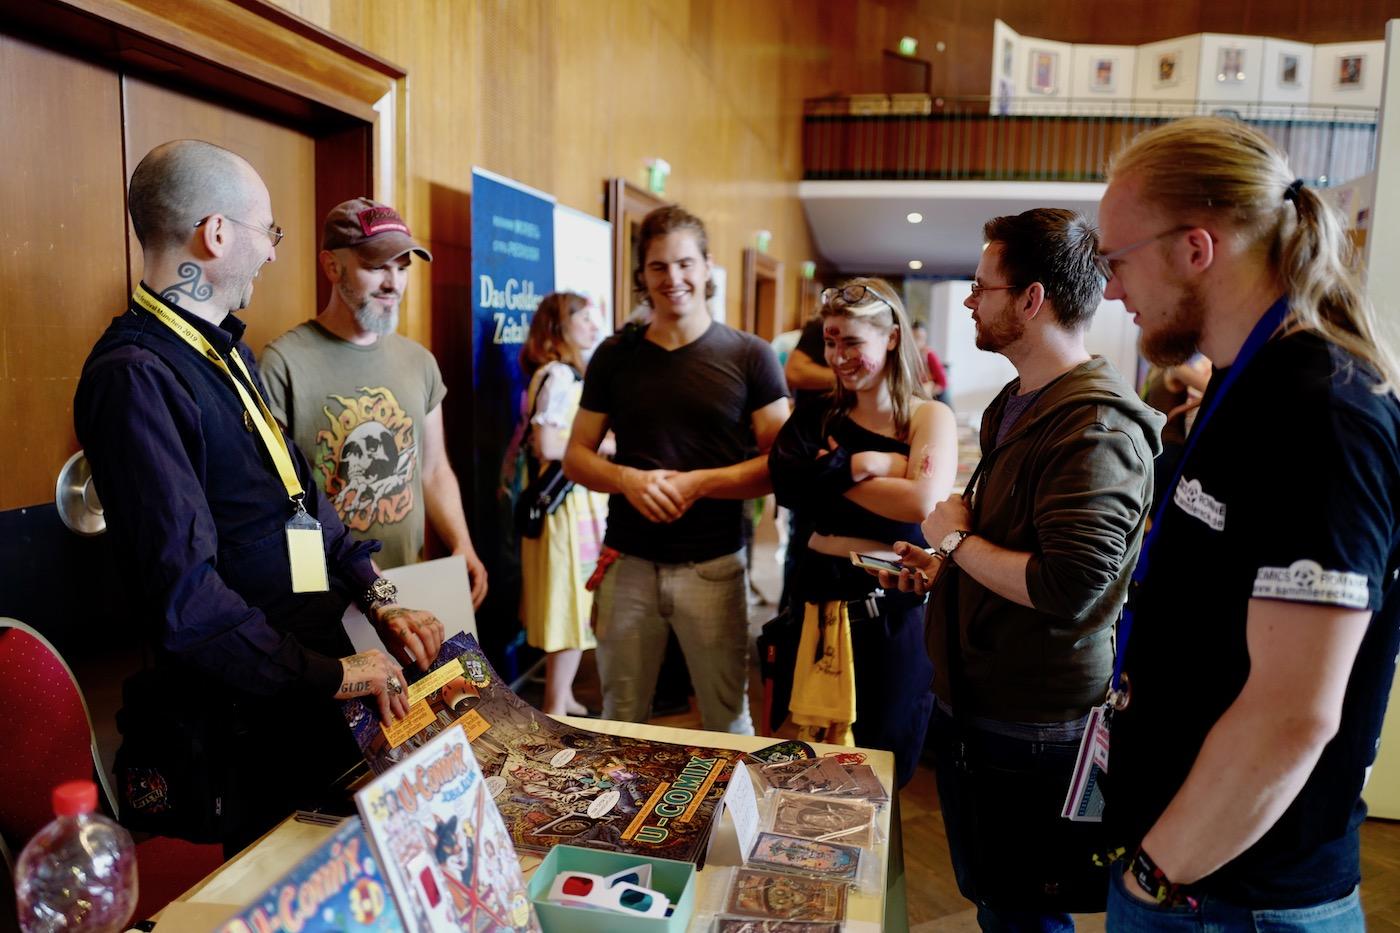 mark_benecke_comic_festival_muenchen_munich_comic_con_2019 - 20.jpg